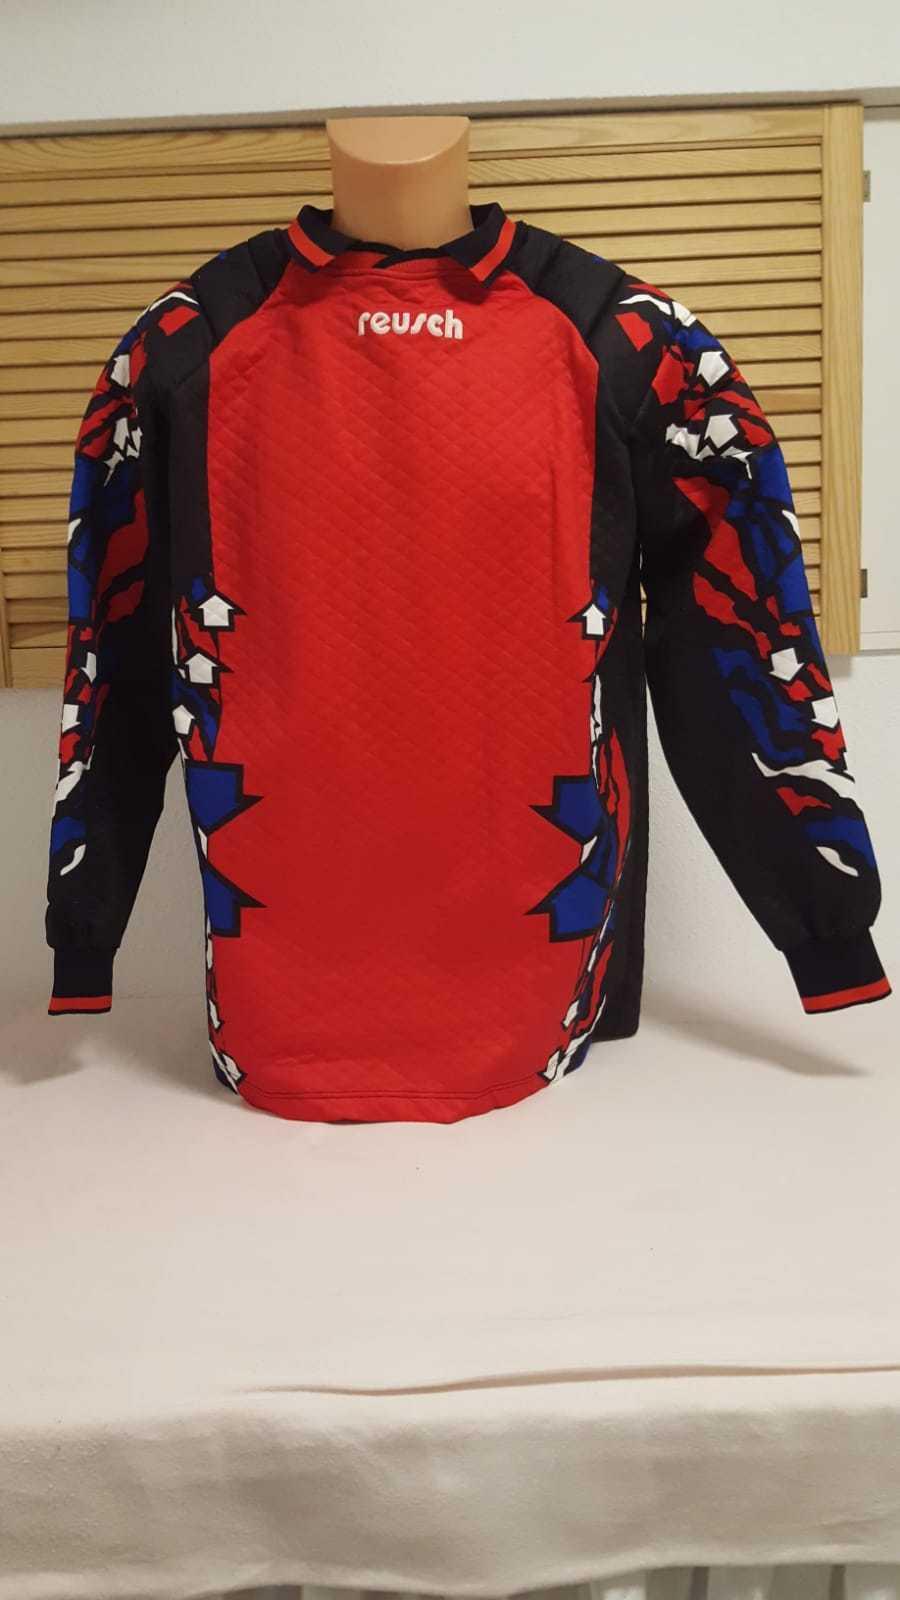 Reusch Vintage Retro Torwart Trikot Shirt Jersey Maglia Camiseta Goalkeeper XL  | Modernes Design